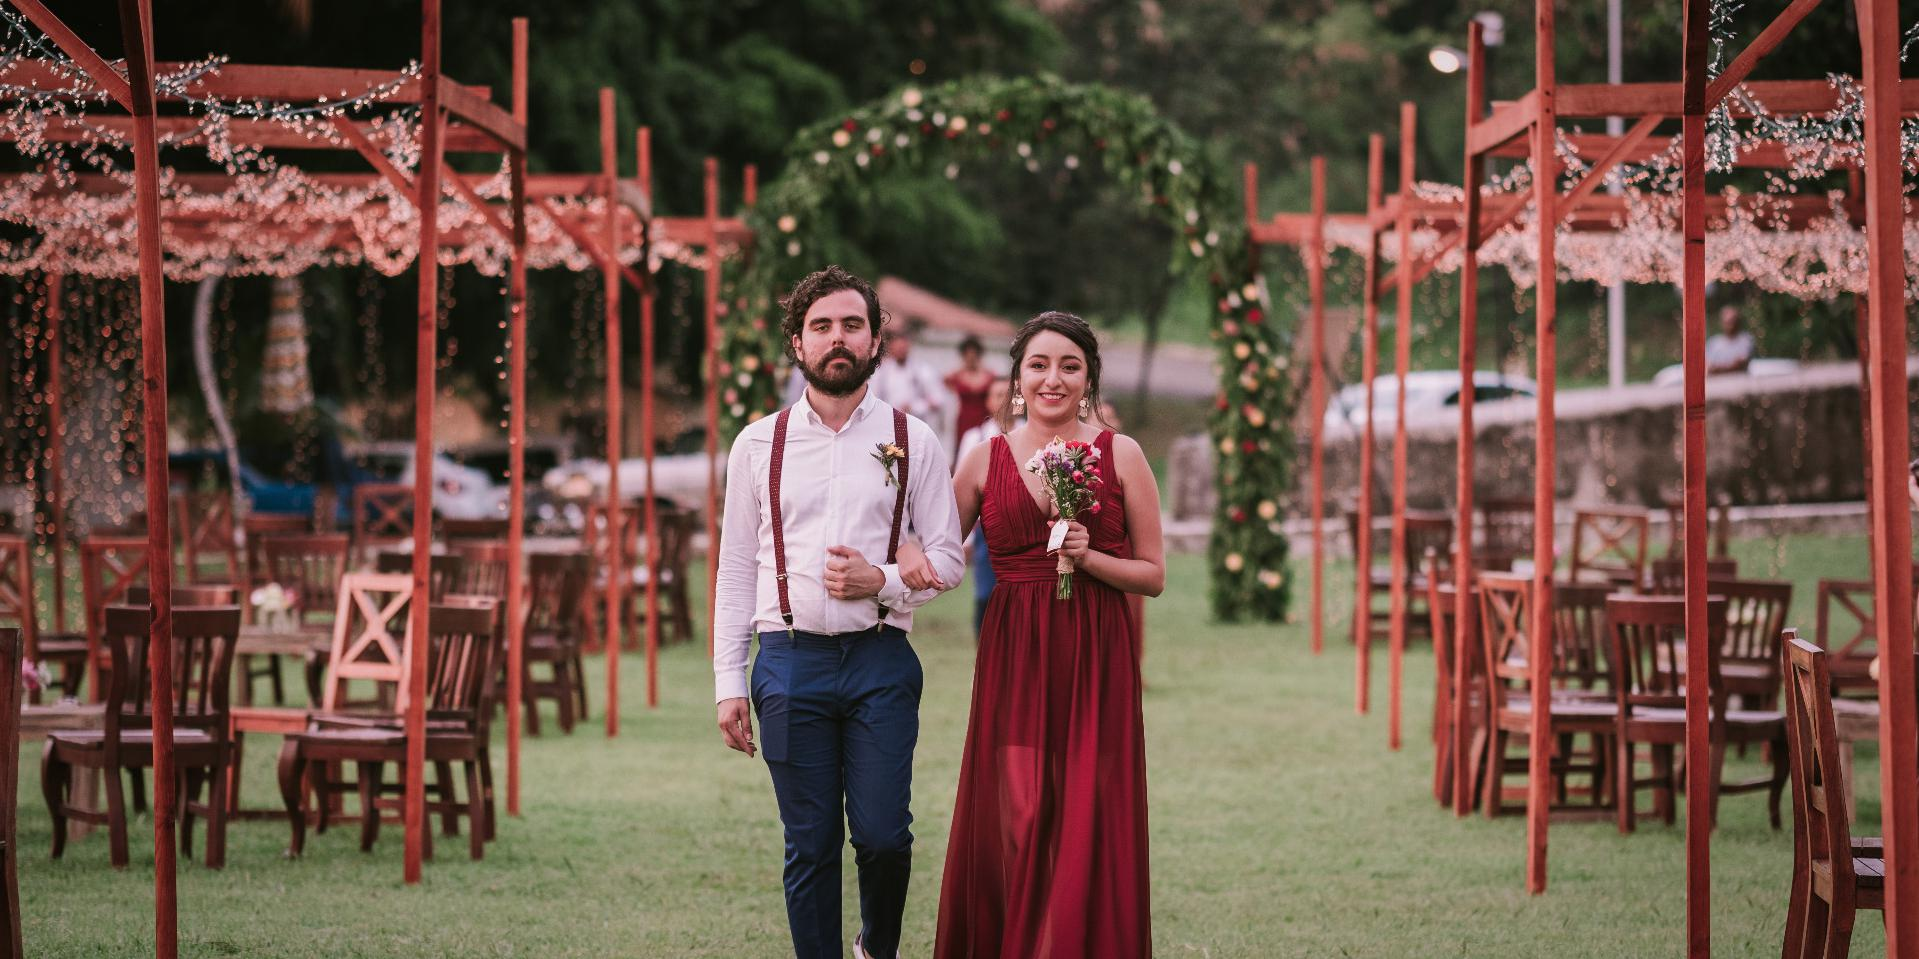 bodas-sin-clasificar-sin-tema-cuba-29271.jpg